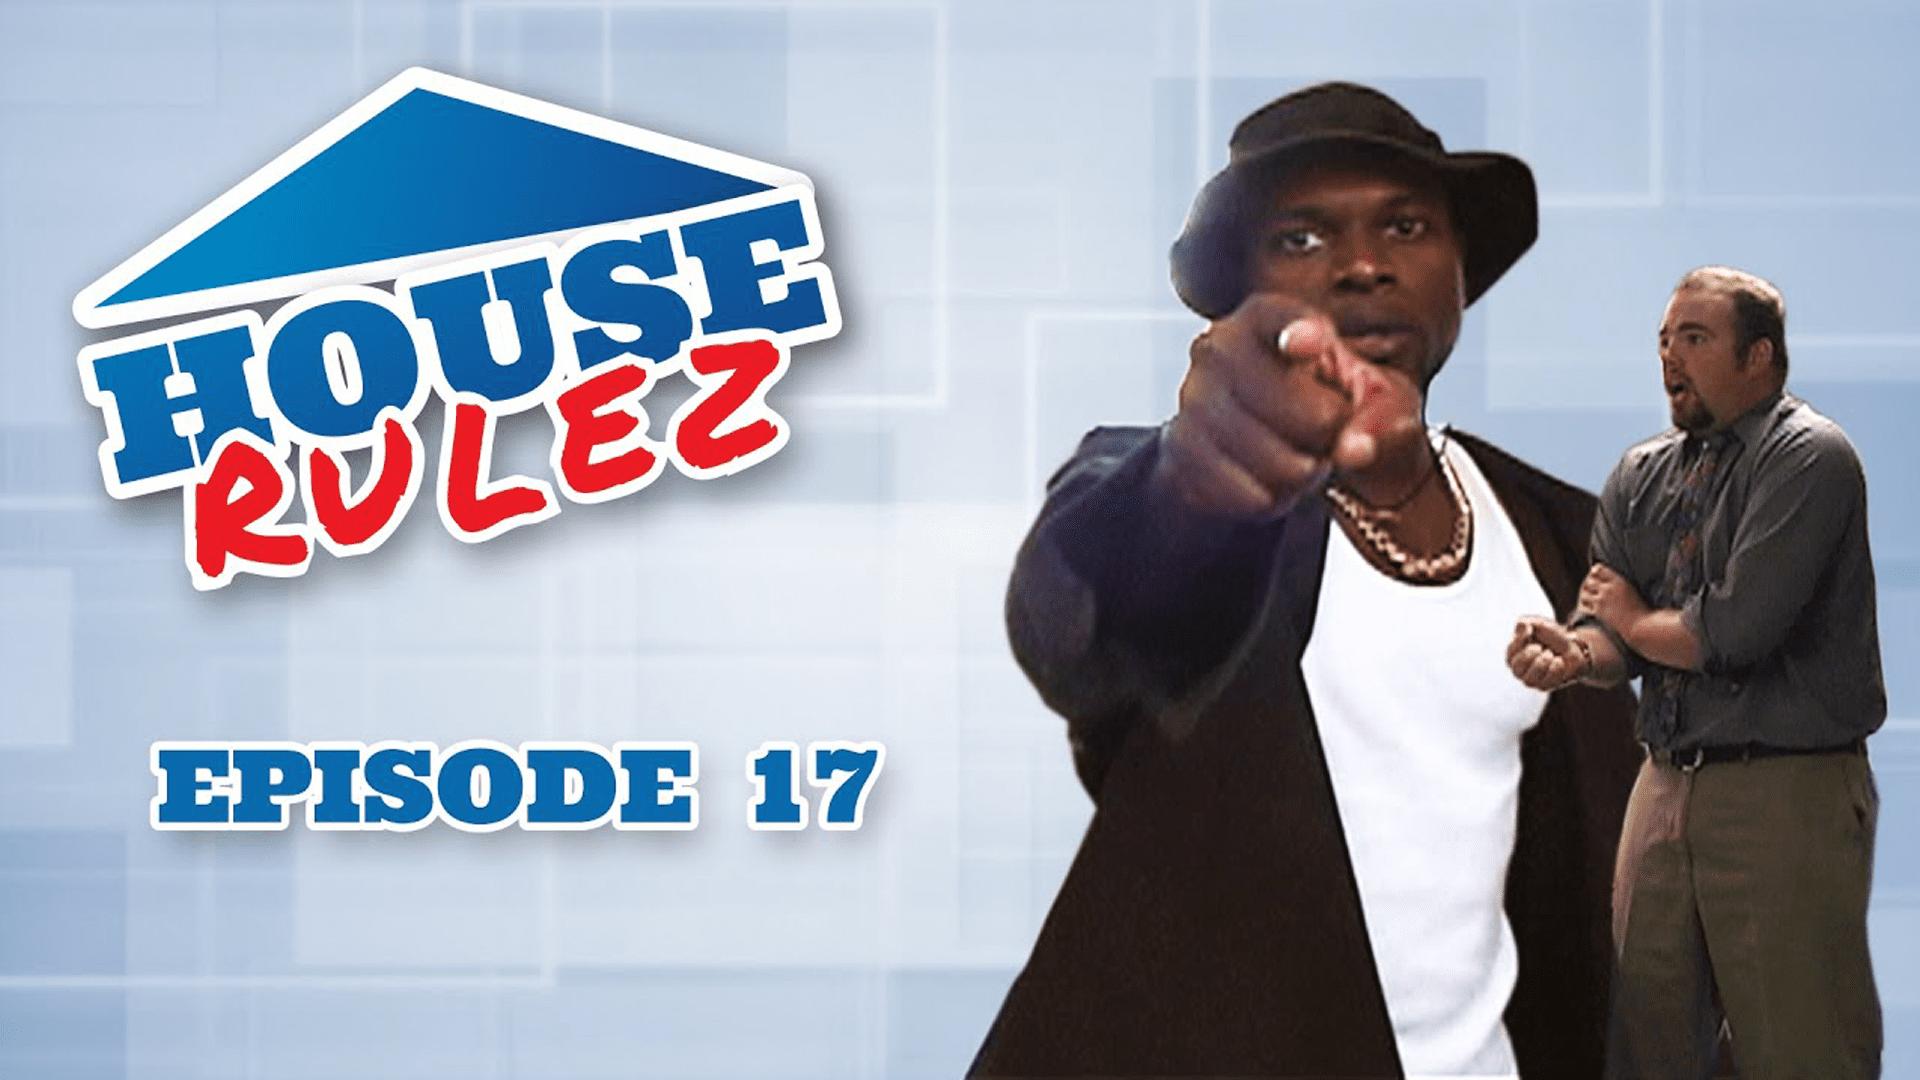 House Rulez Episode 17